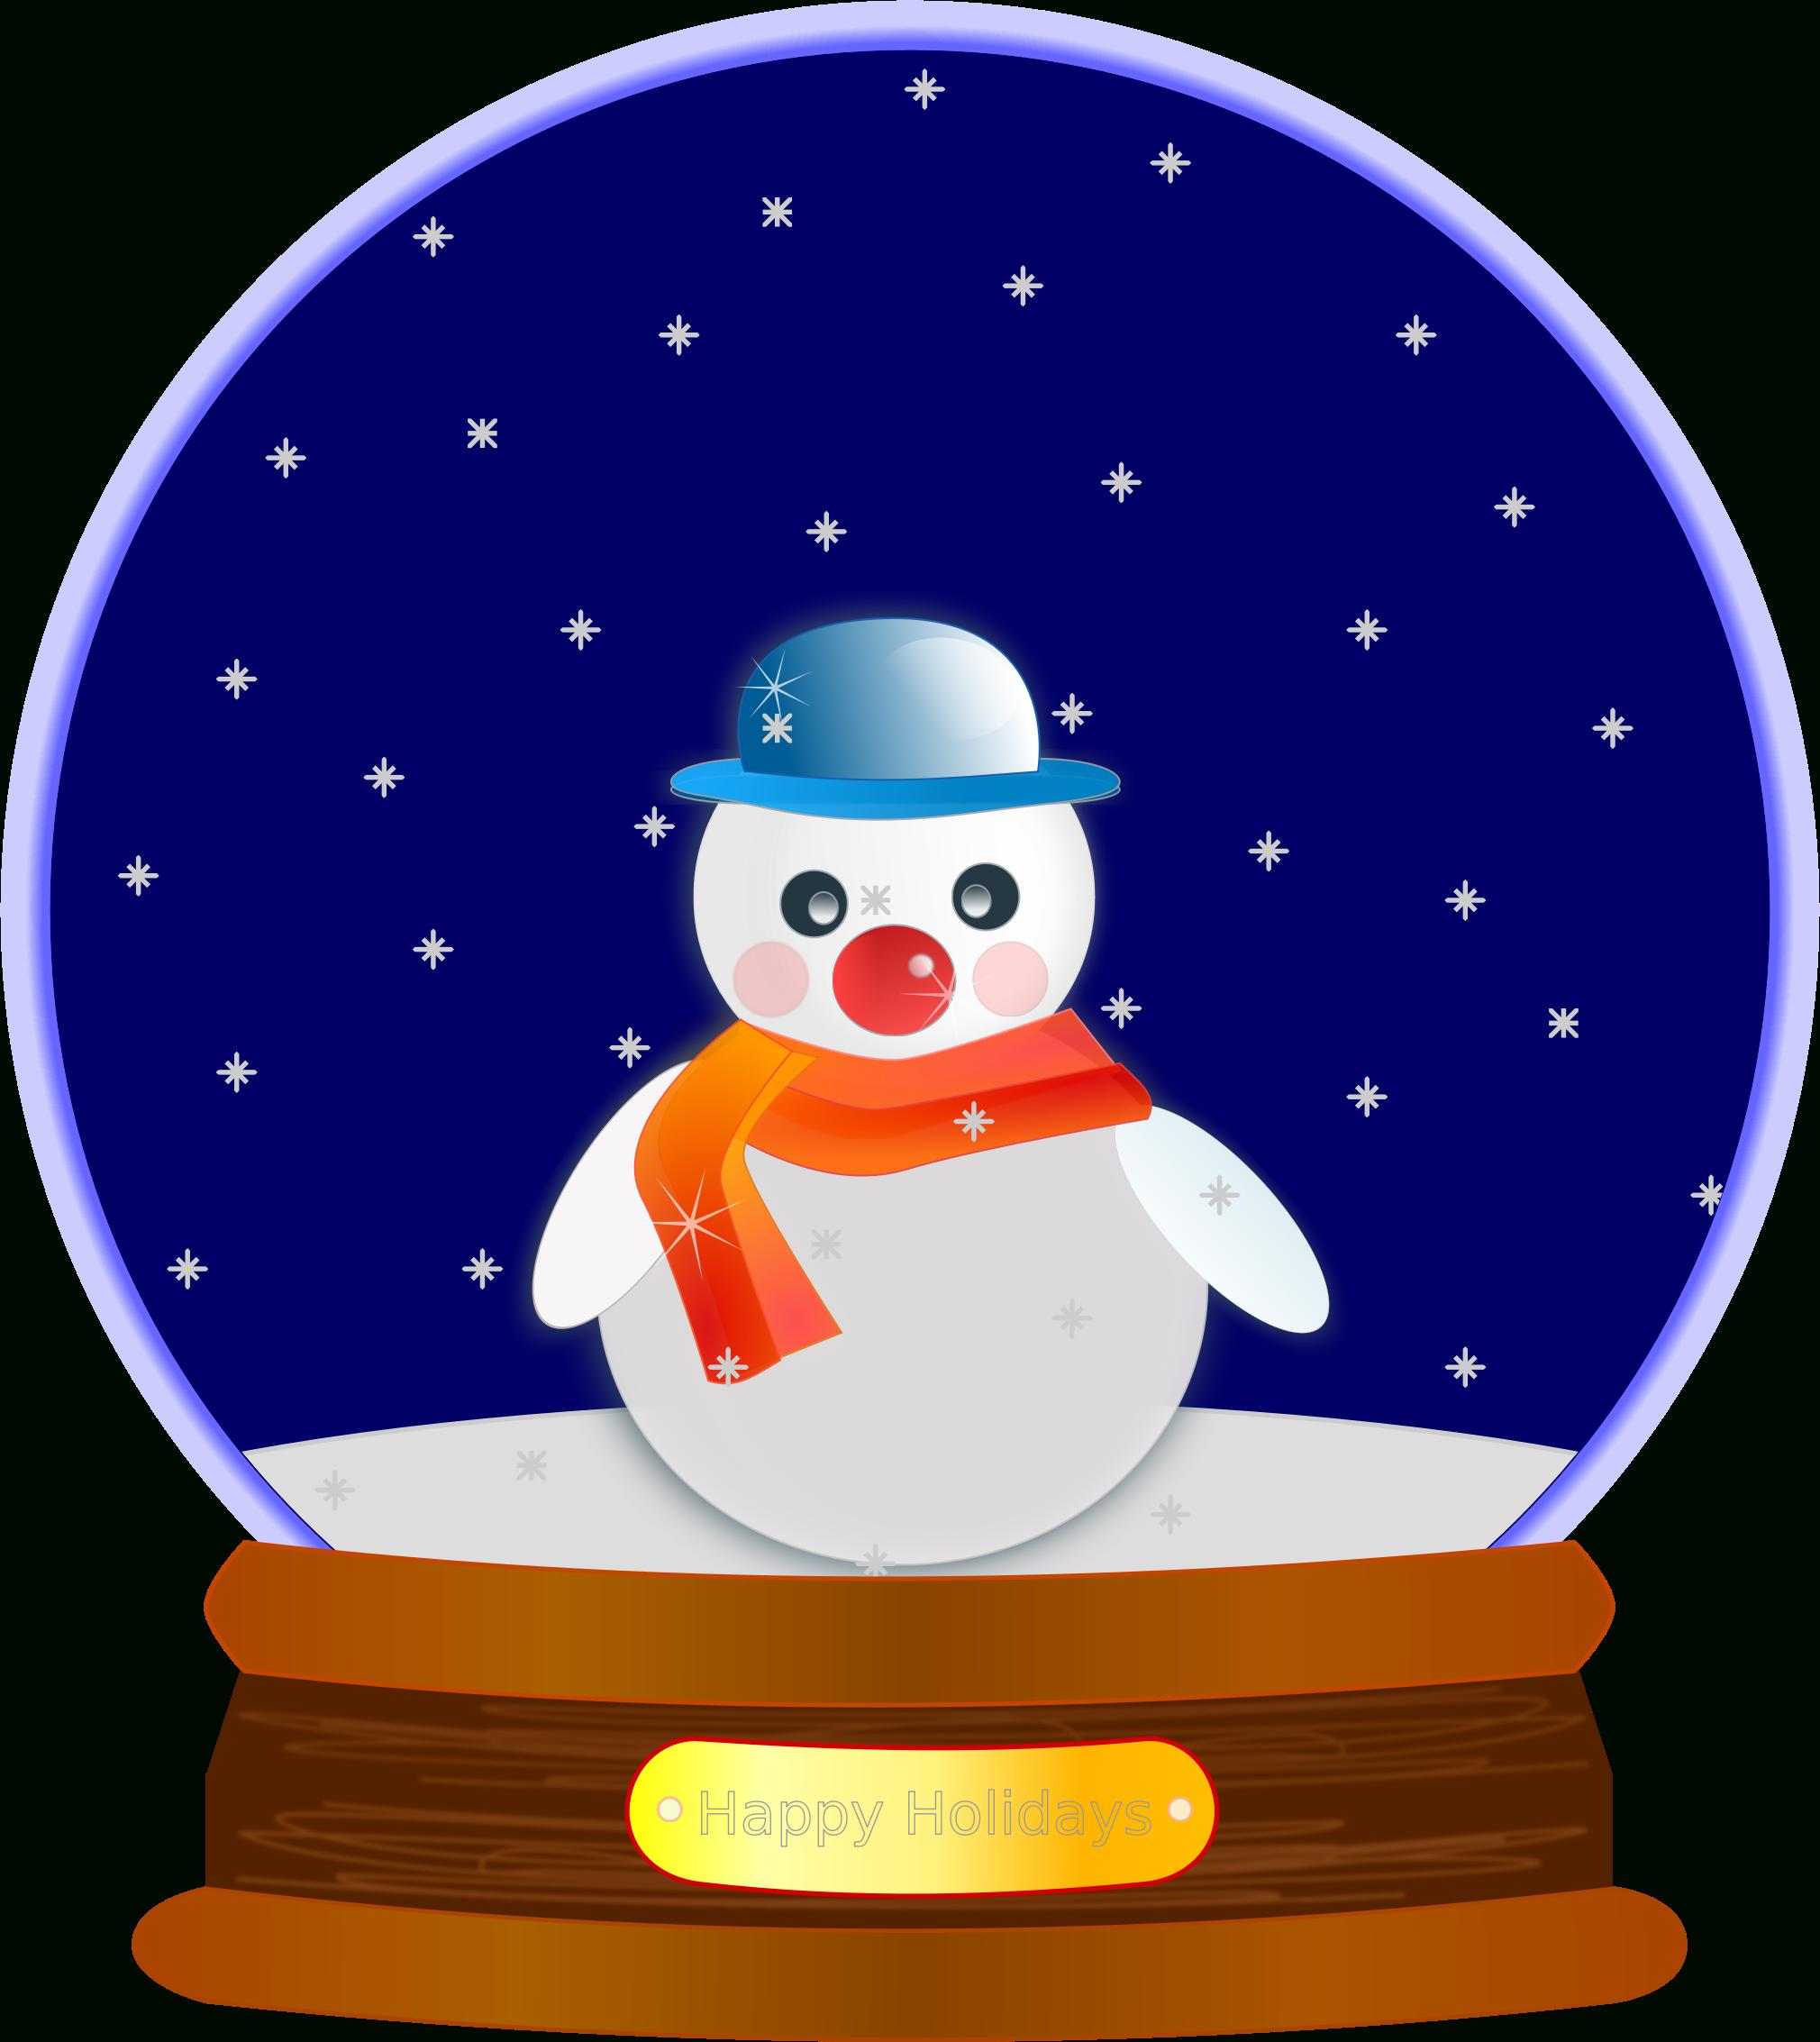 Snow Globe Clipart Globe clipart, Holiday snow globe